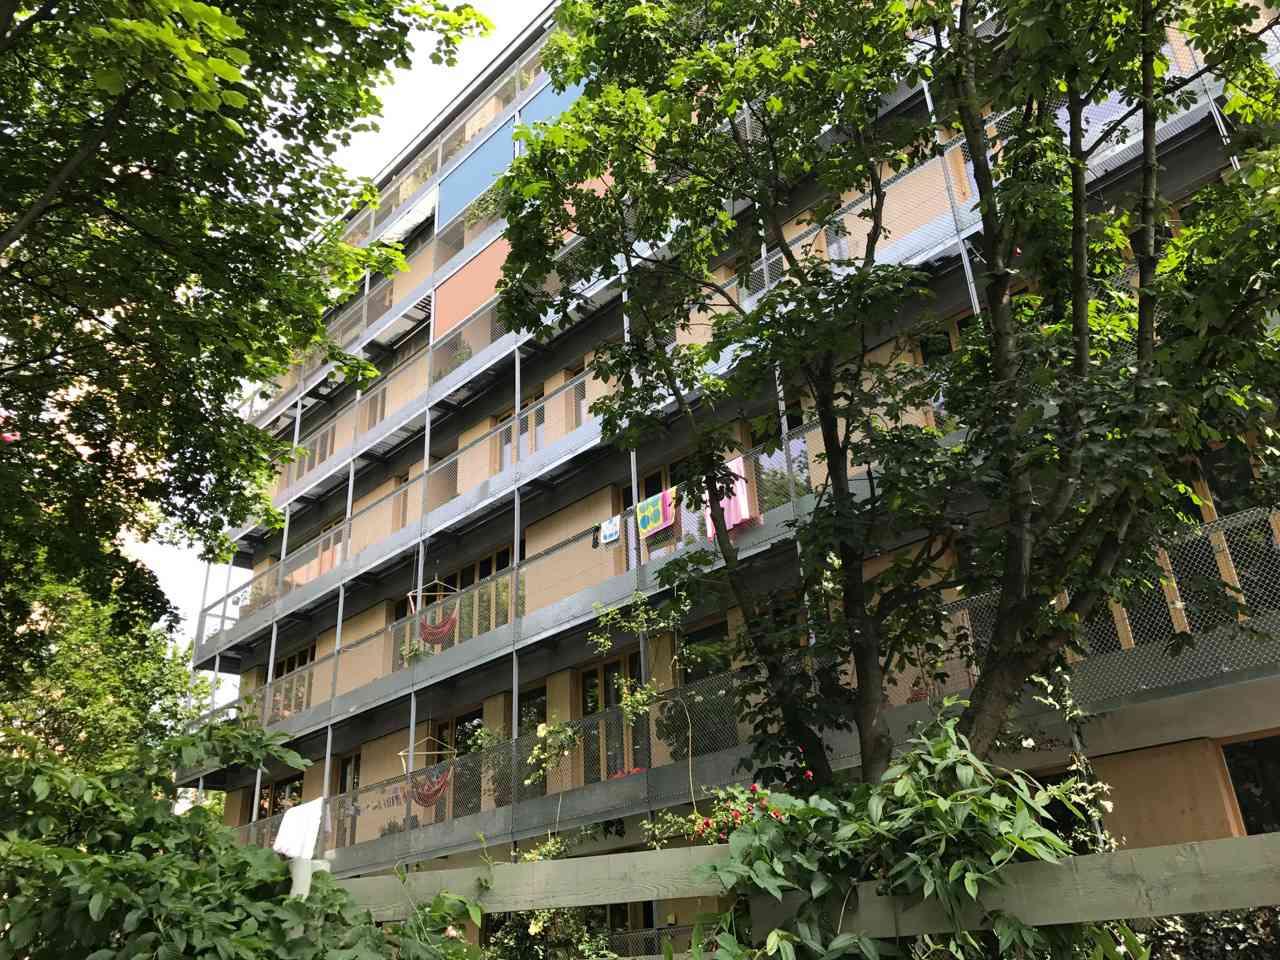 berlin apartment building